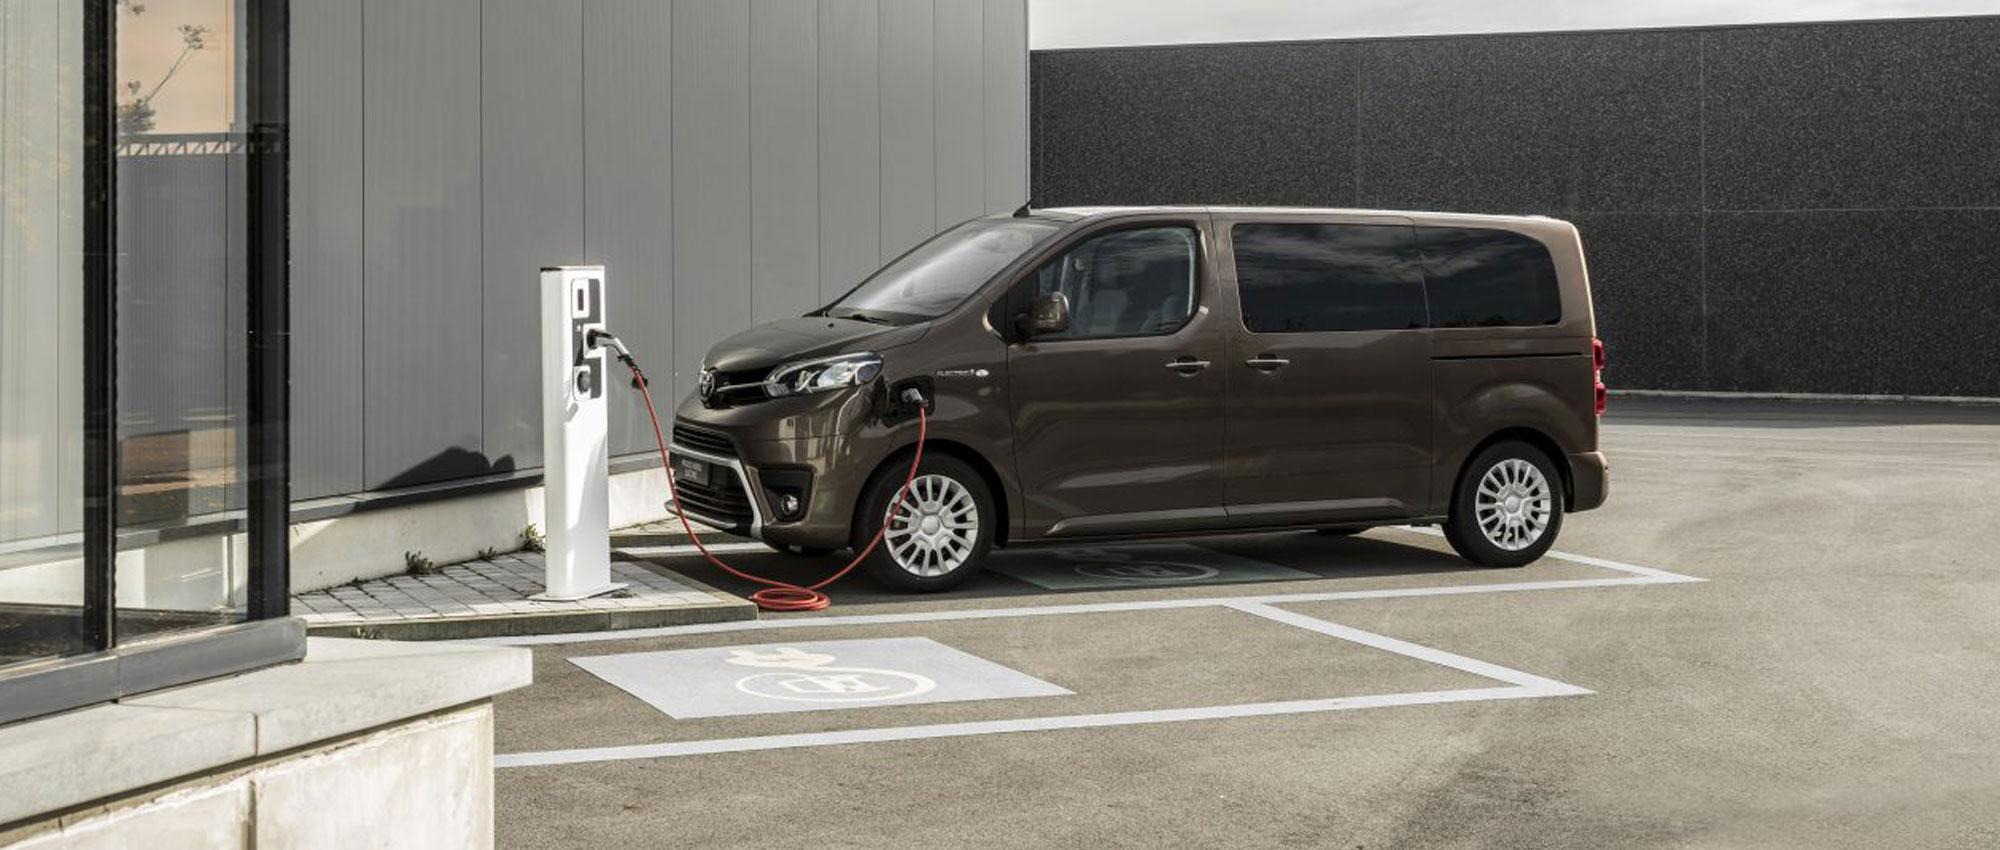 Toyota-proace-electric garage ramaker hattem